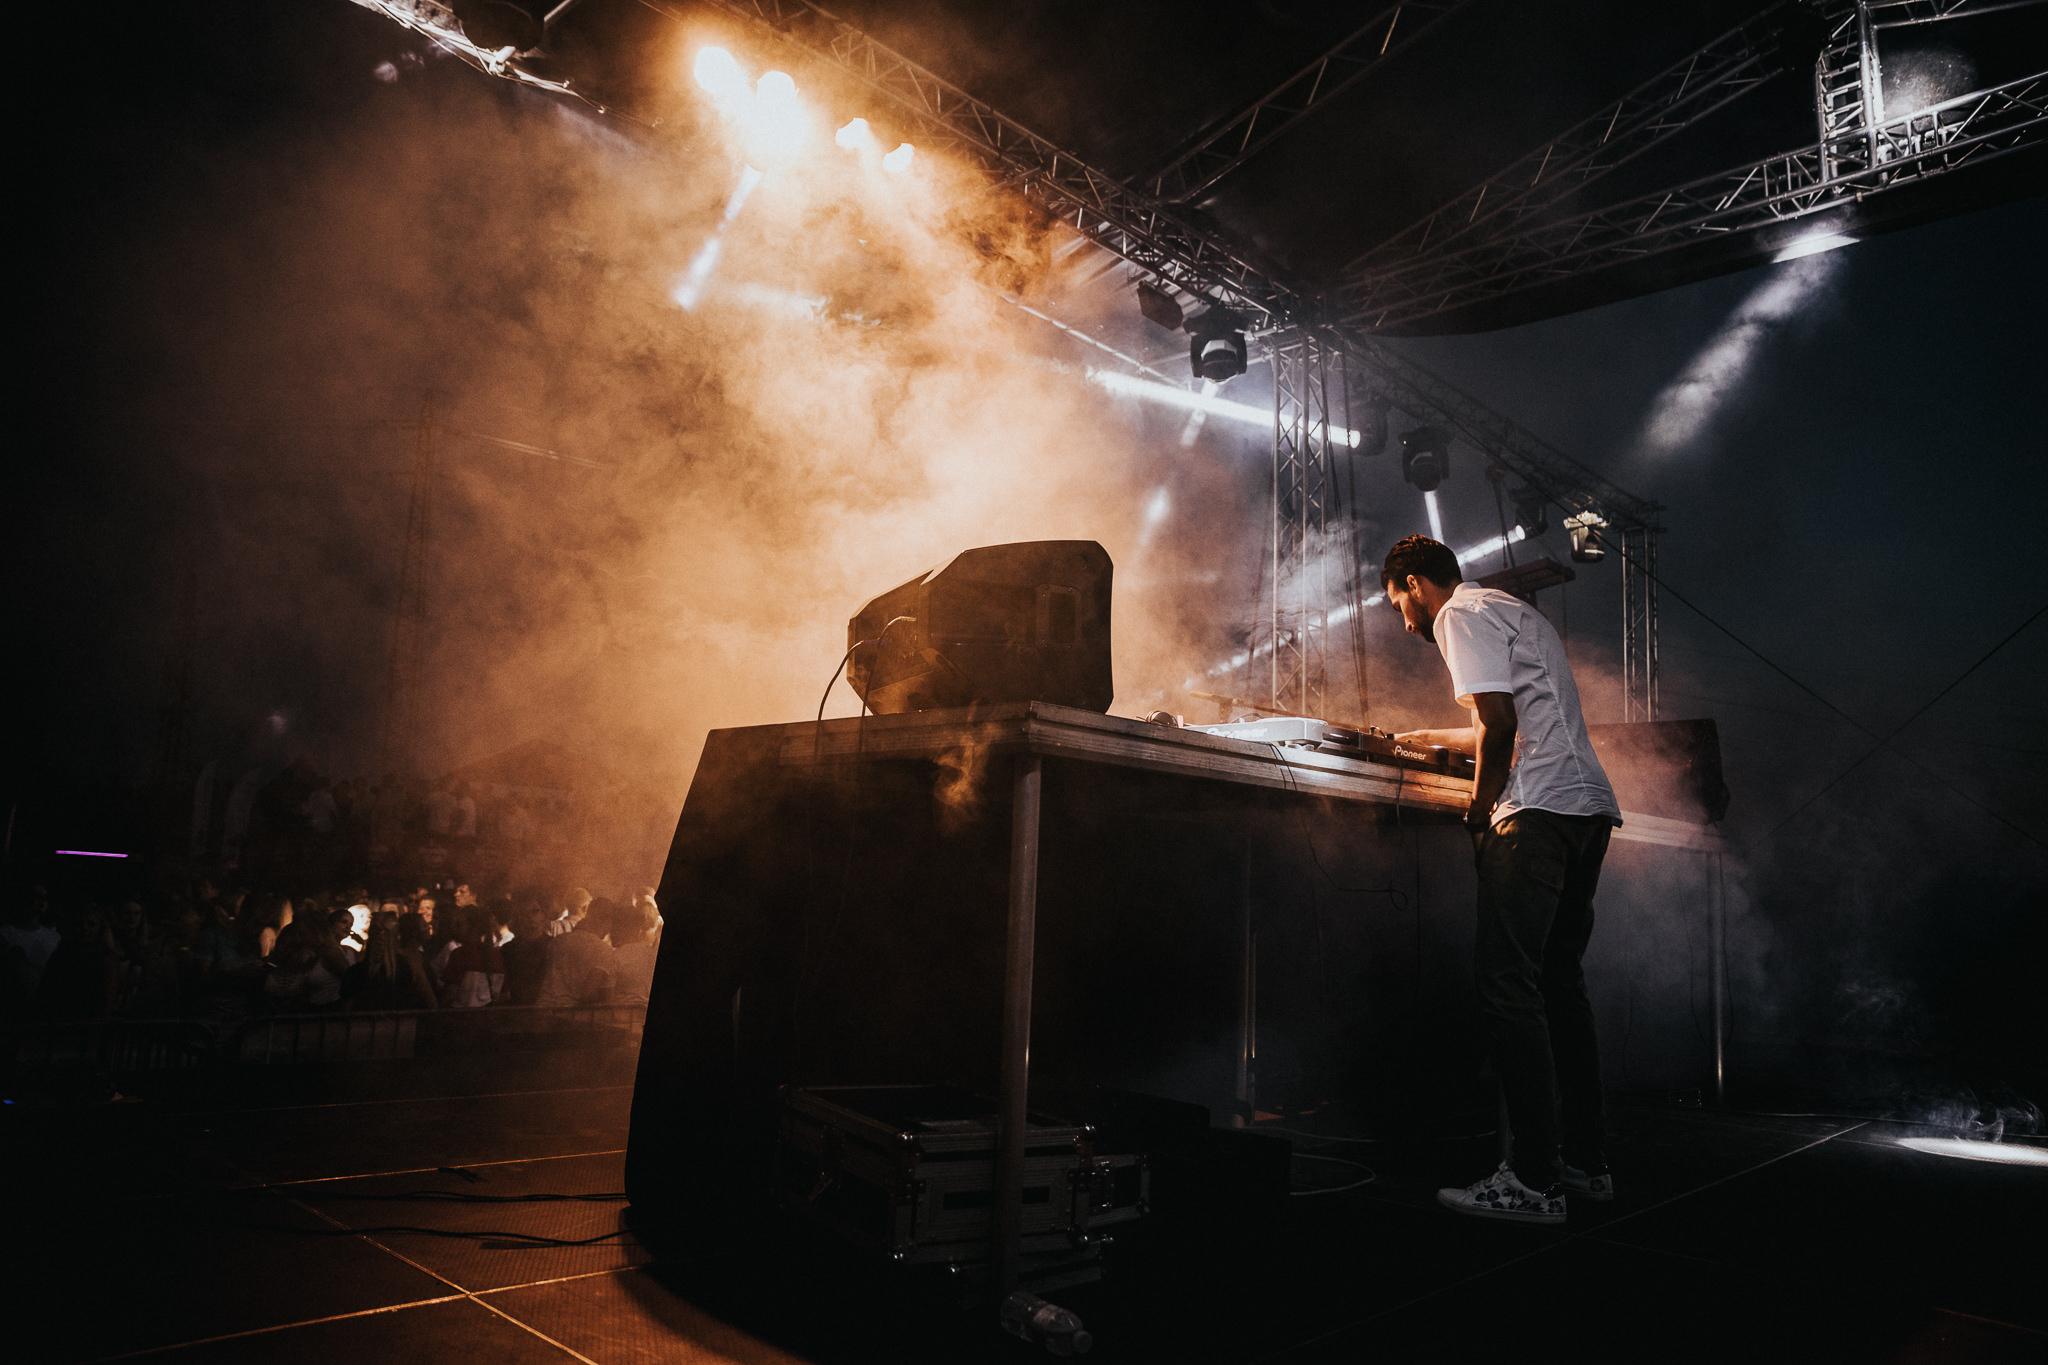 2017-06-21-DJ-FLASH-TOM-BARBIER-9451-LD.jpg